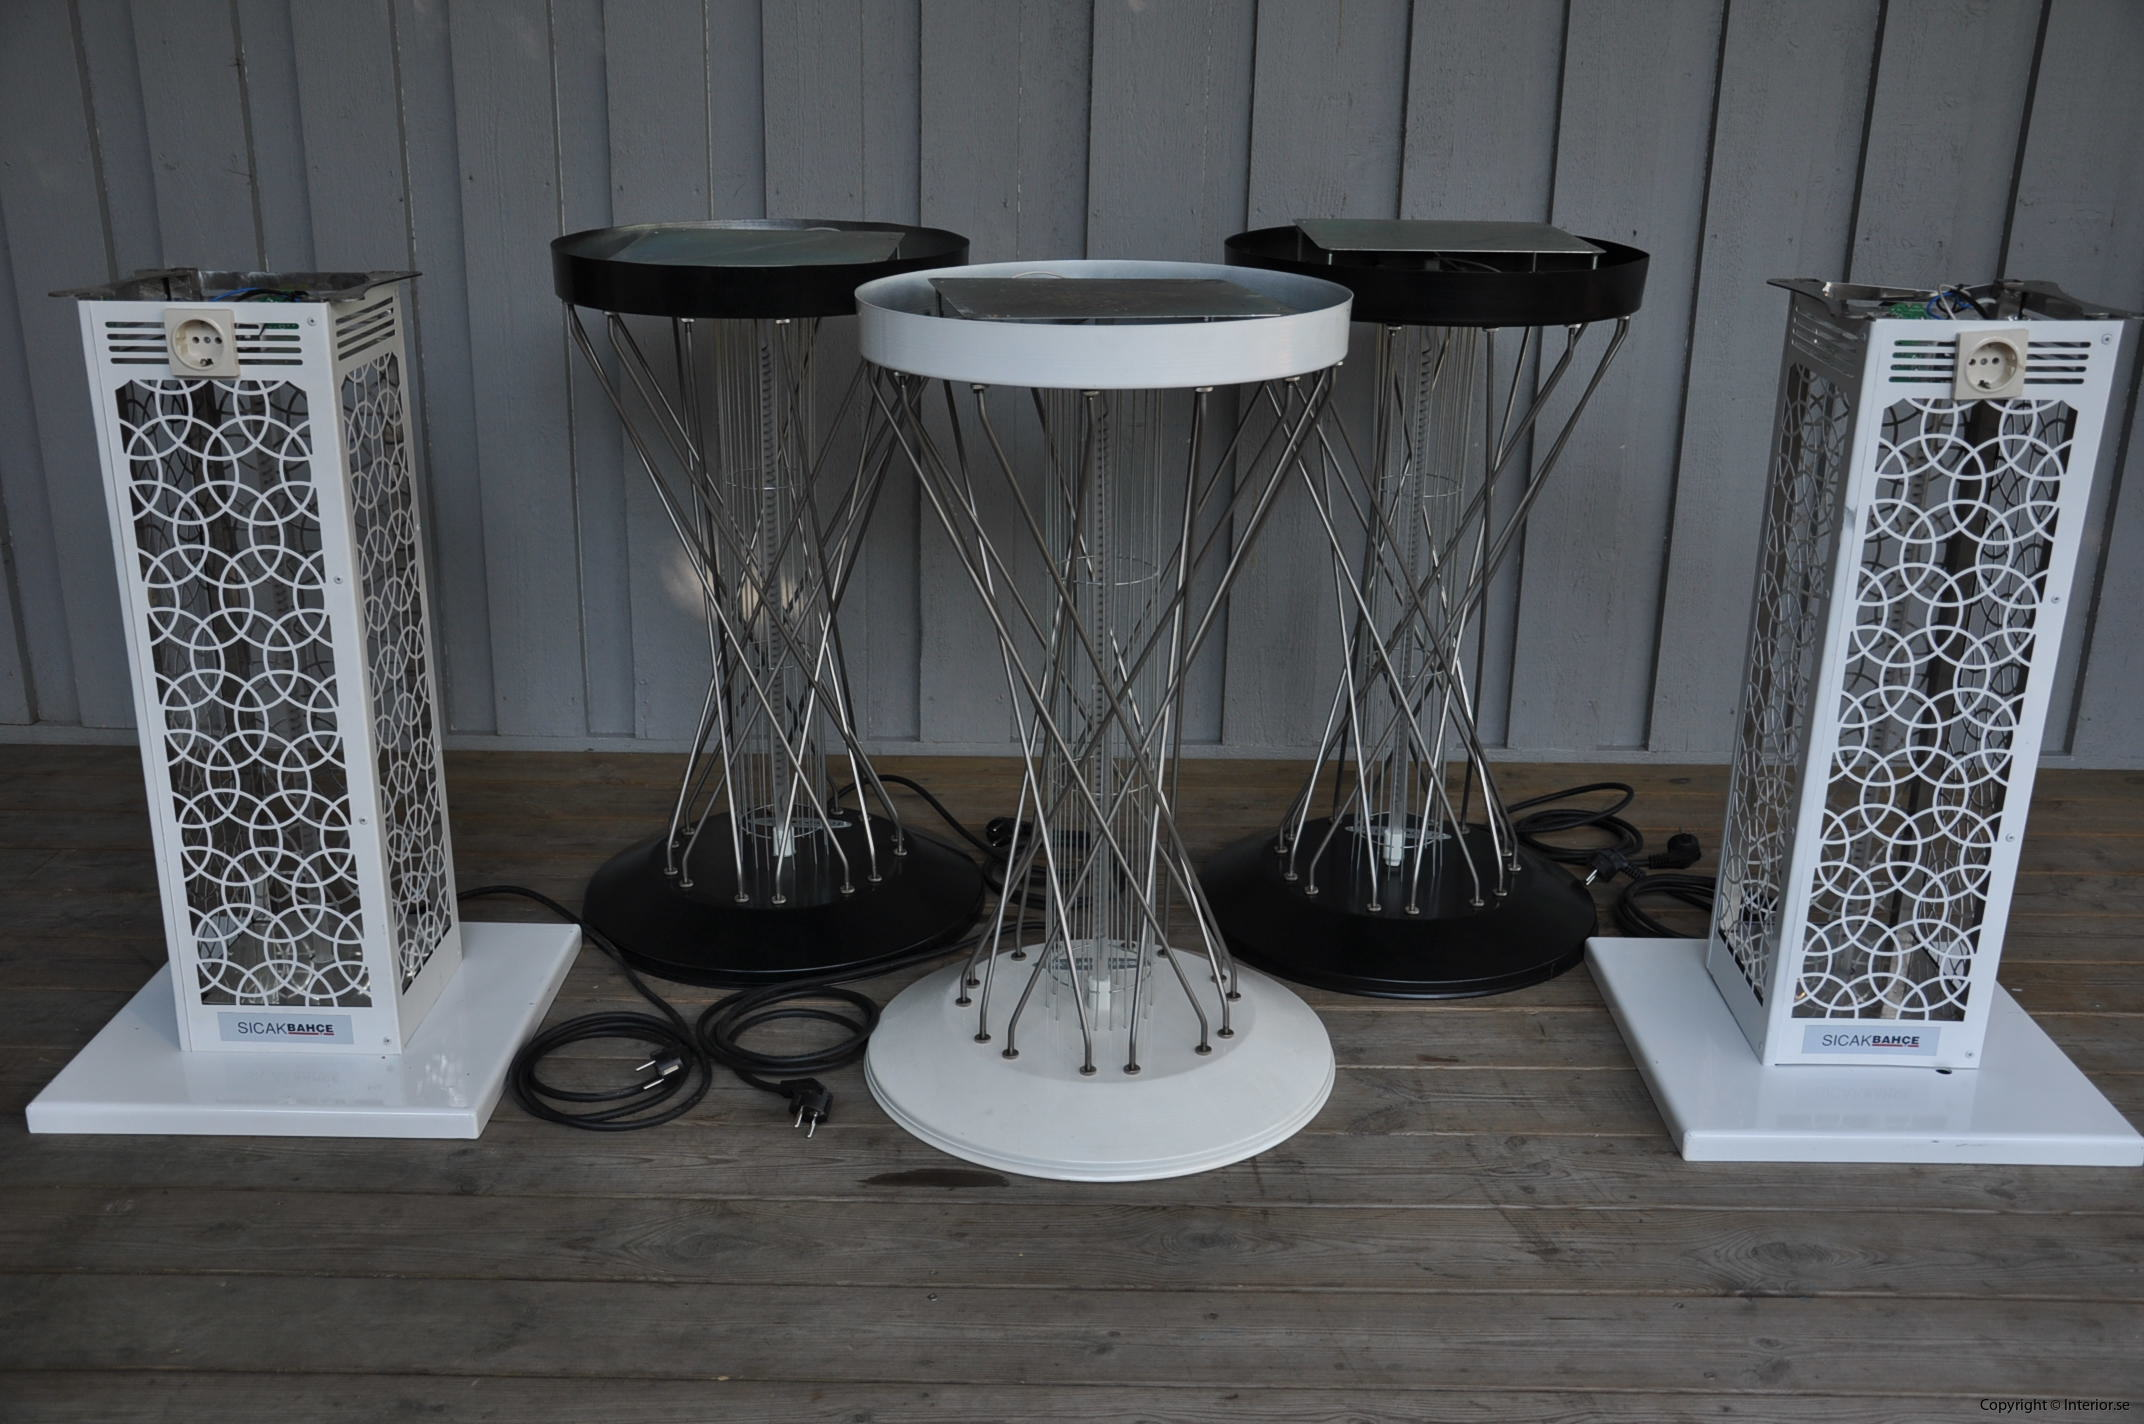 Bord med inbyggd infravärme Hyra möbler stockholm event sverige